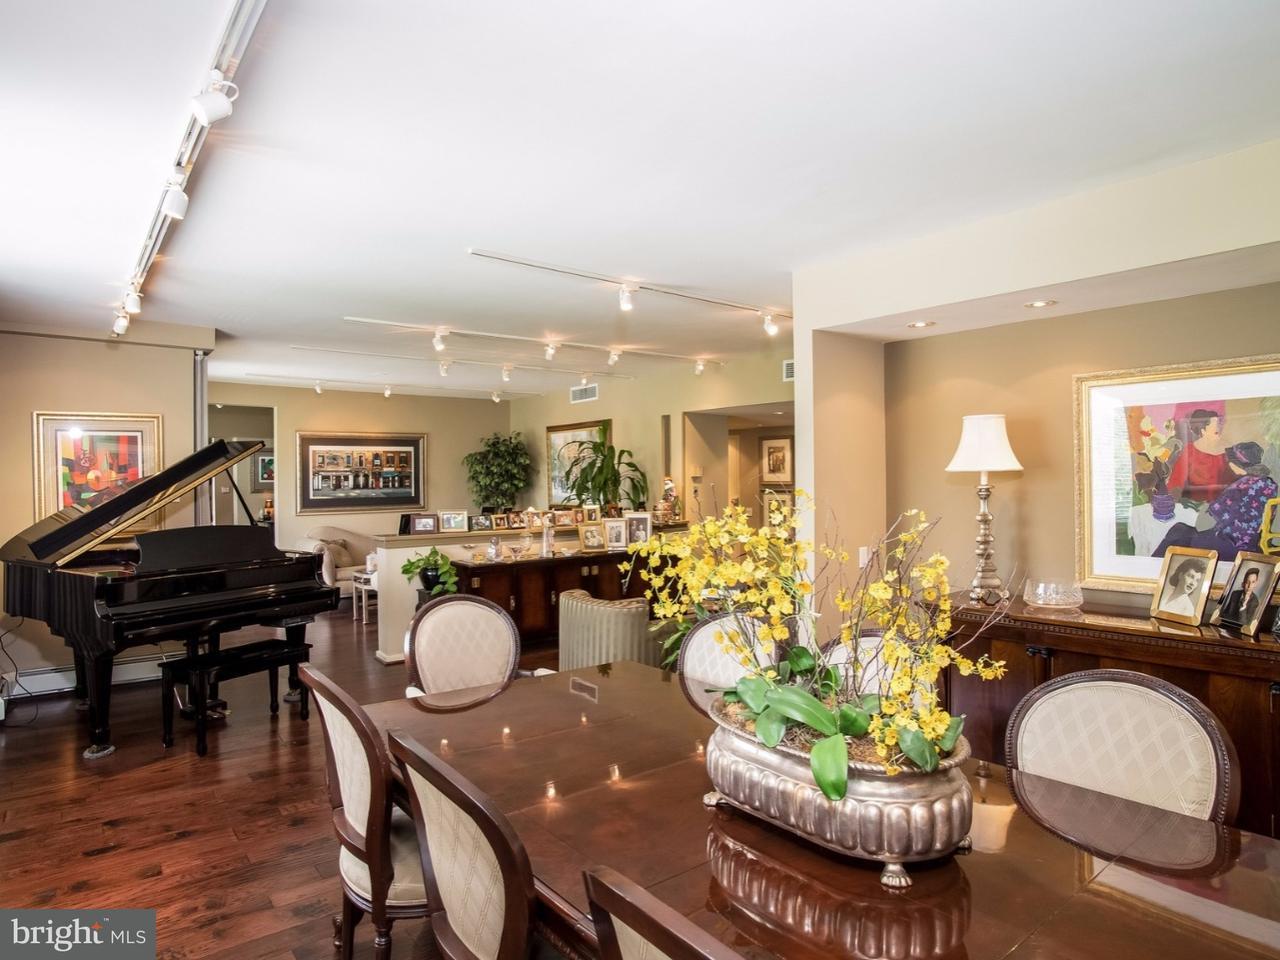 Additional photo for property listing at 191 PRESIDENTIAL BLVD #328-29  Bala Cynwyd, Pennsylvania 19004 Estados Unidos